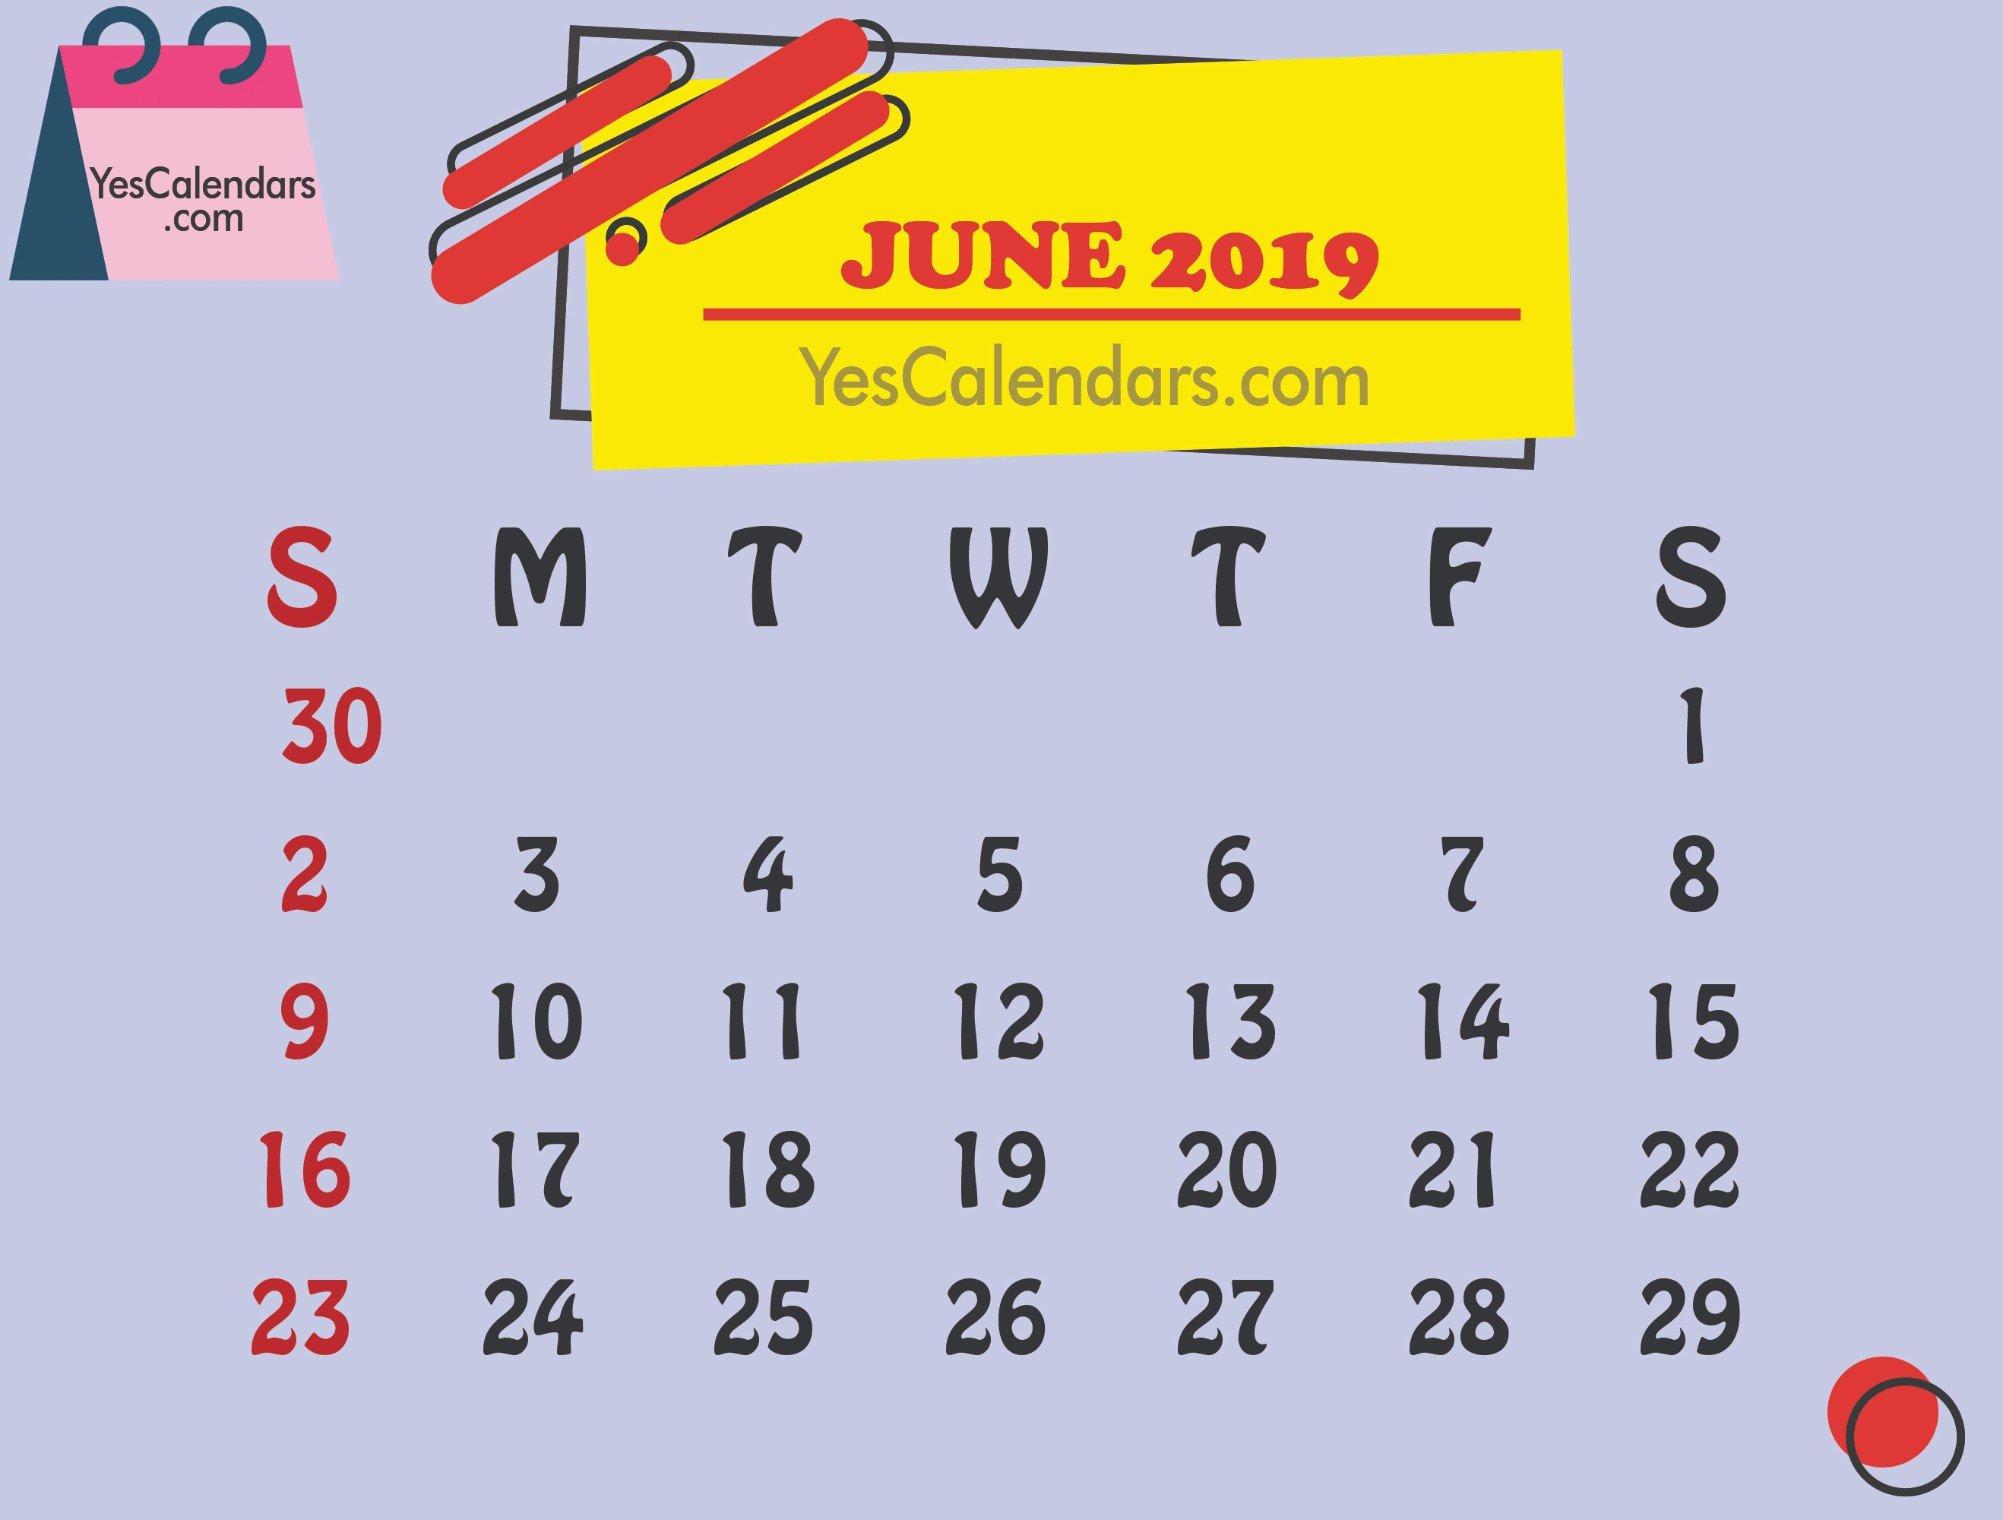 Printable June 2019 Calendar Template Holidays – Yes Calendars June 2 2019 Calendar